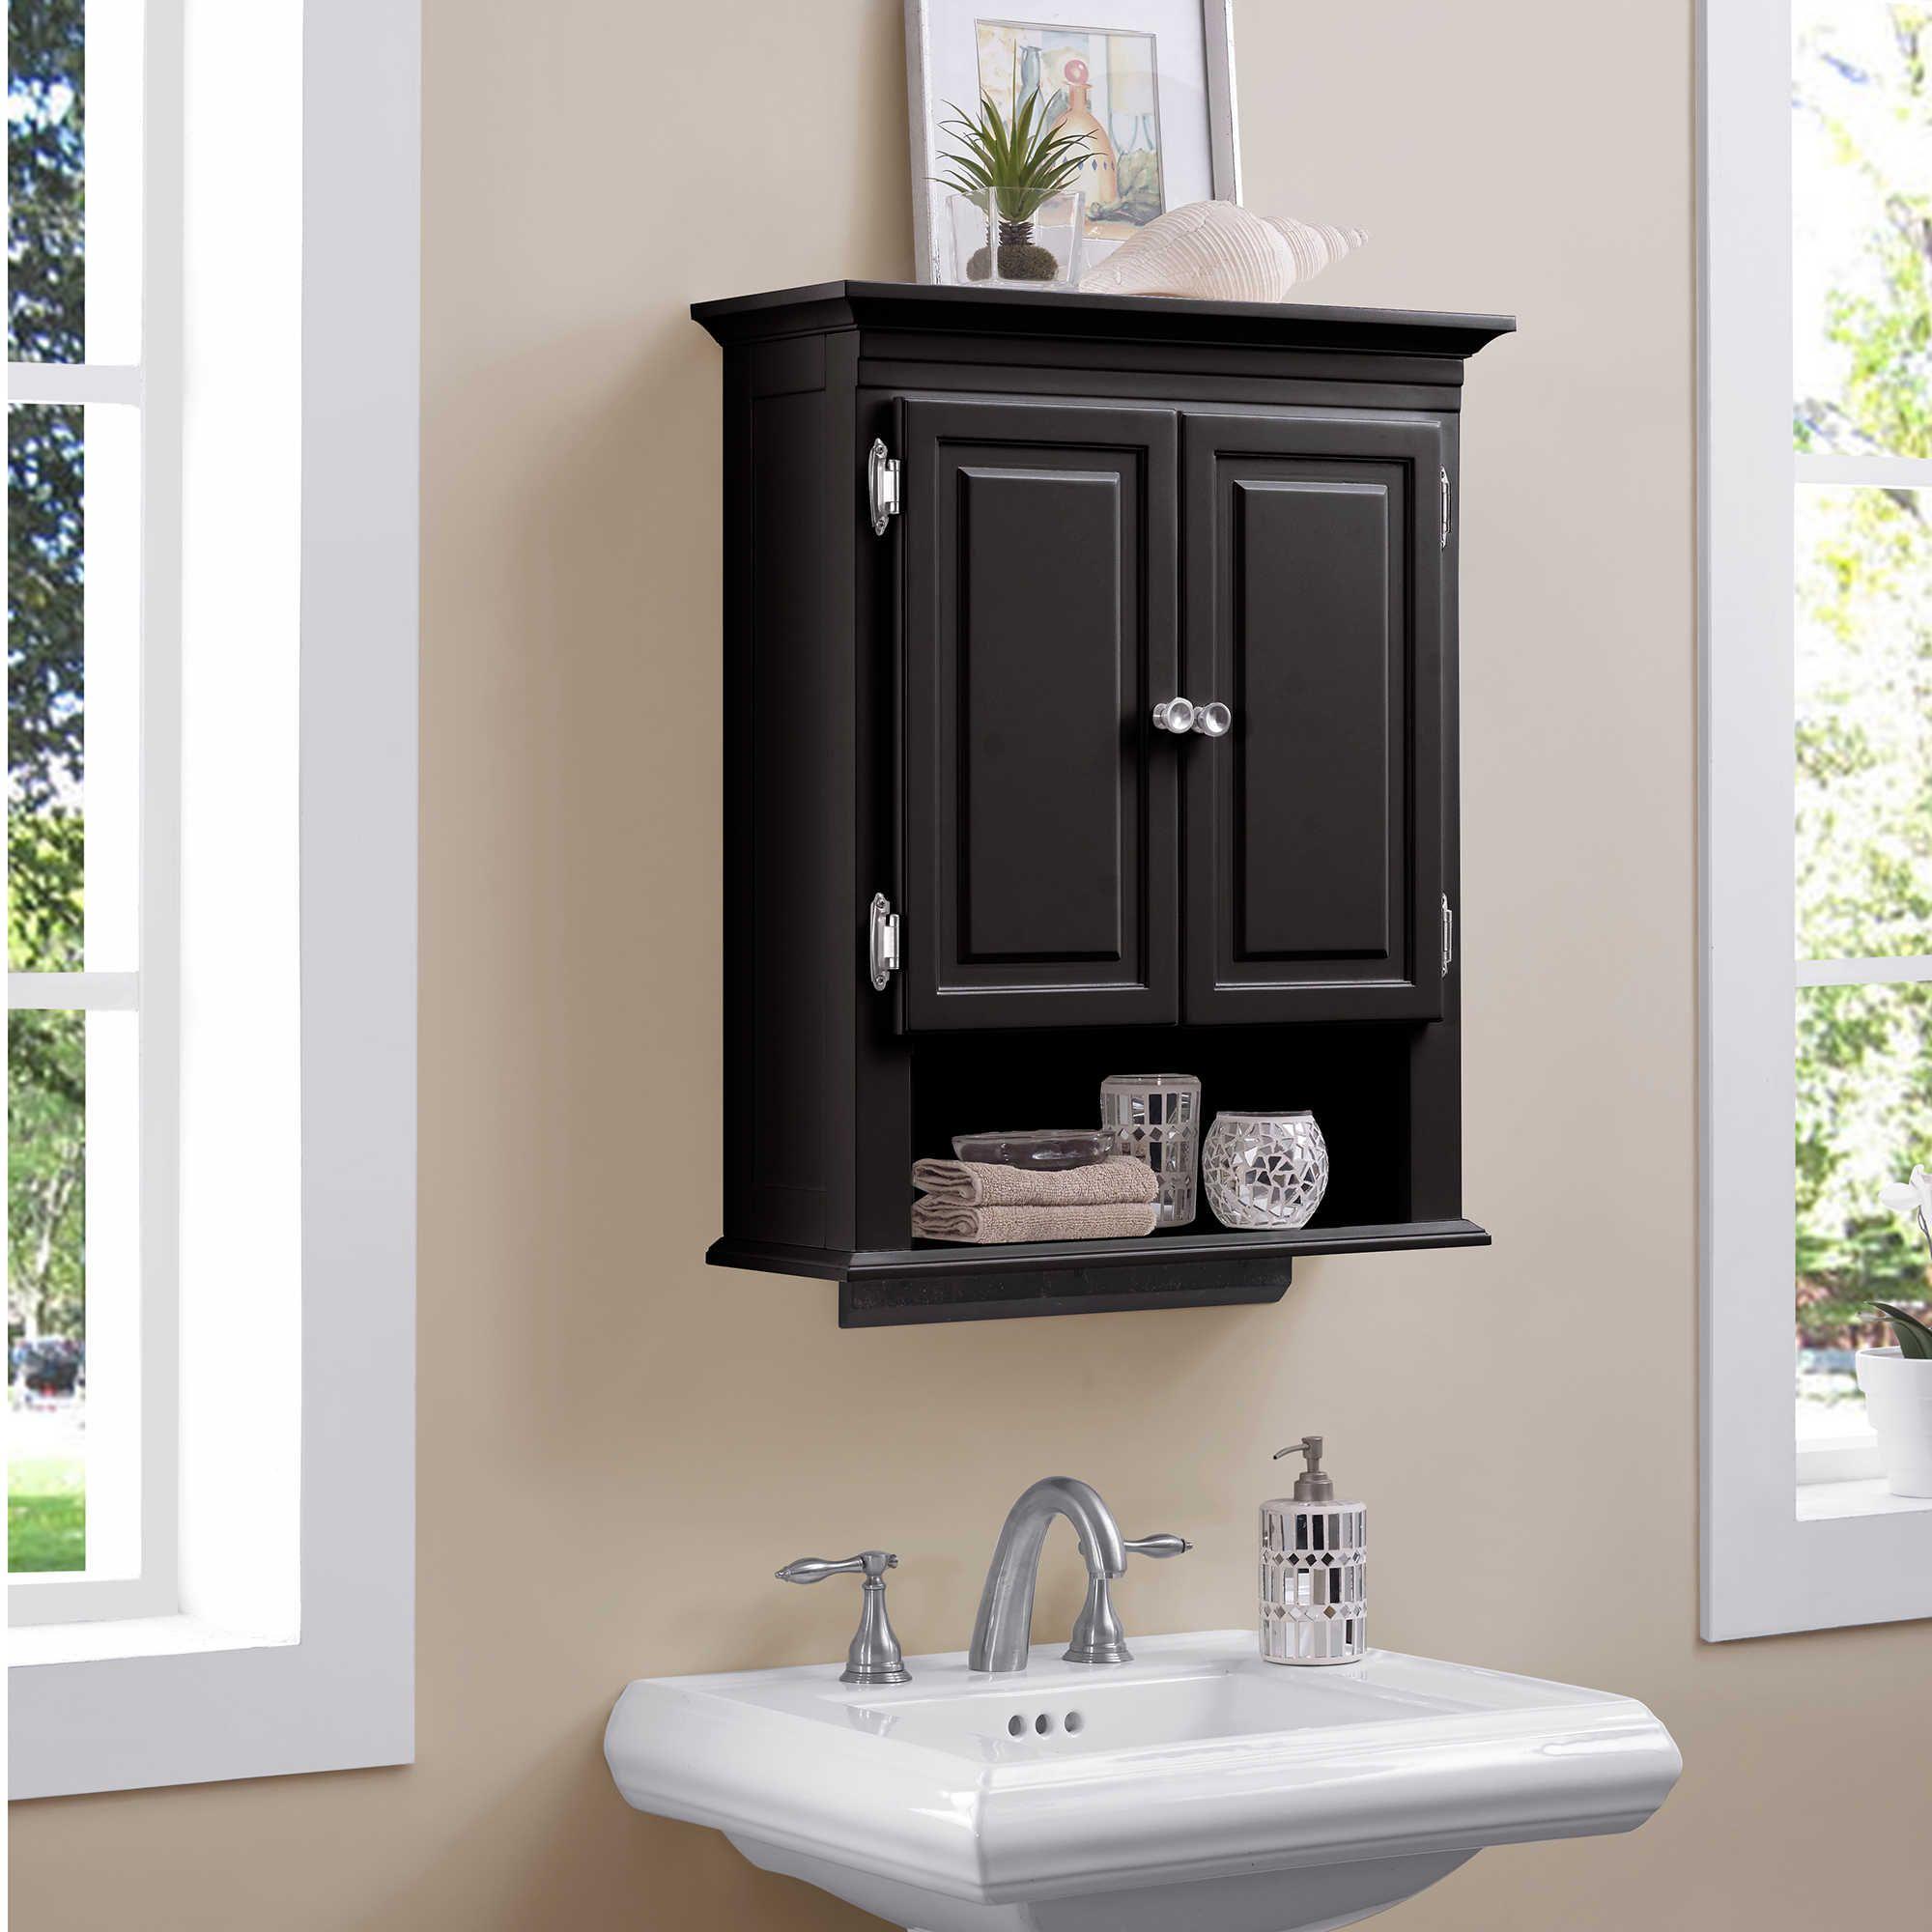 Wakefield No Tools Wall Cabinet Bed Bath Beyond Wall Cabinet Bathroom Wall Cabinets Bathroom Essentials